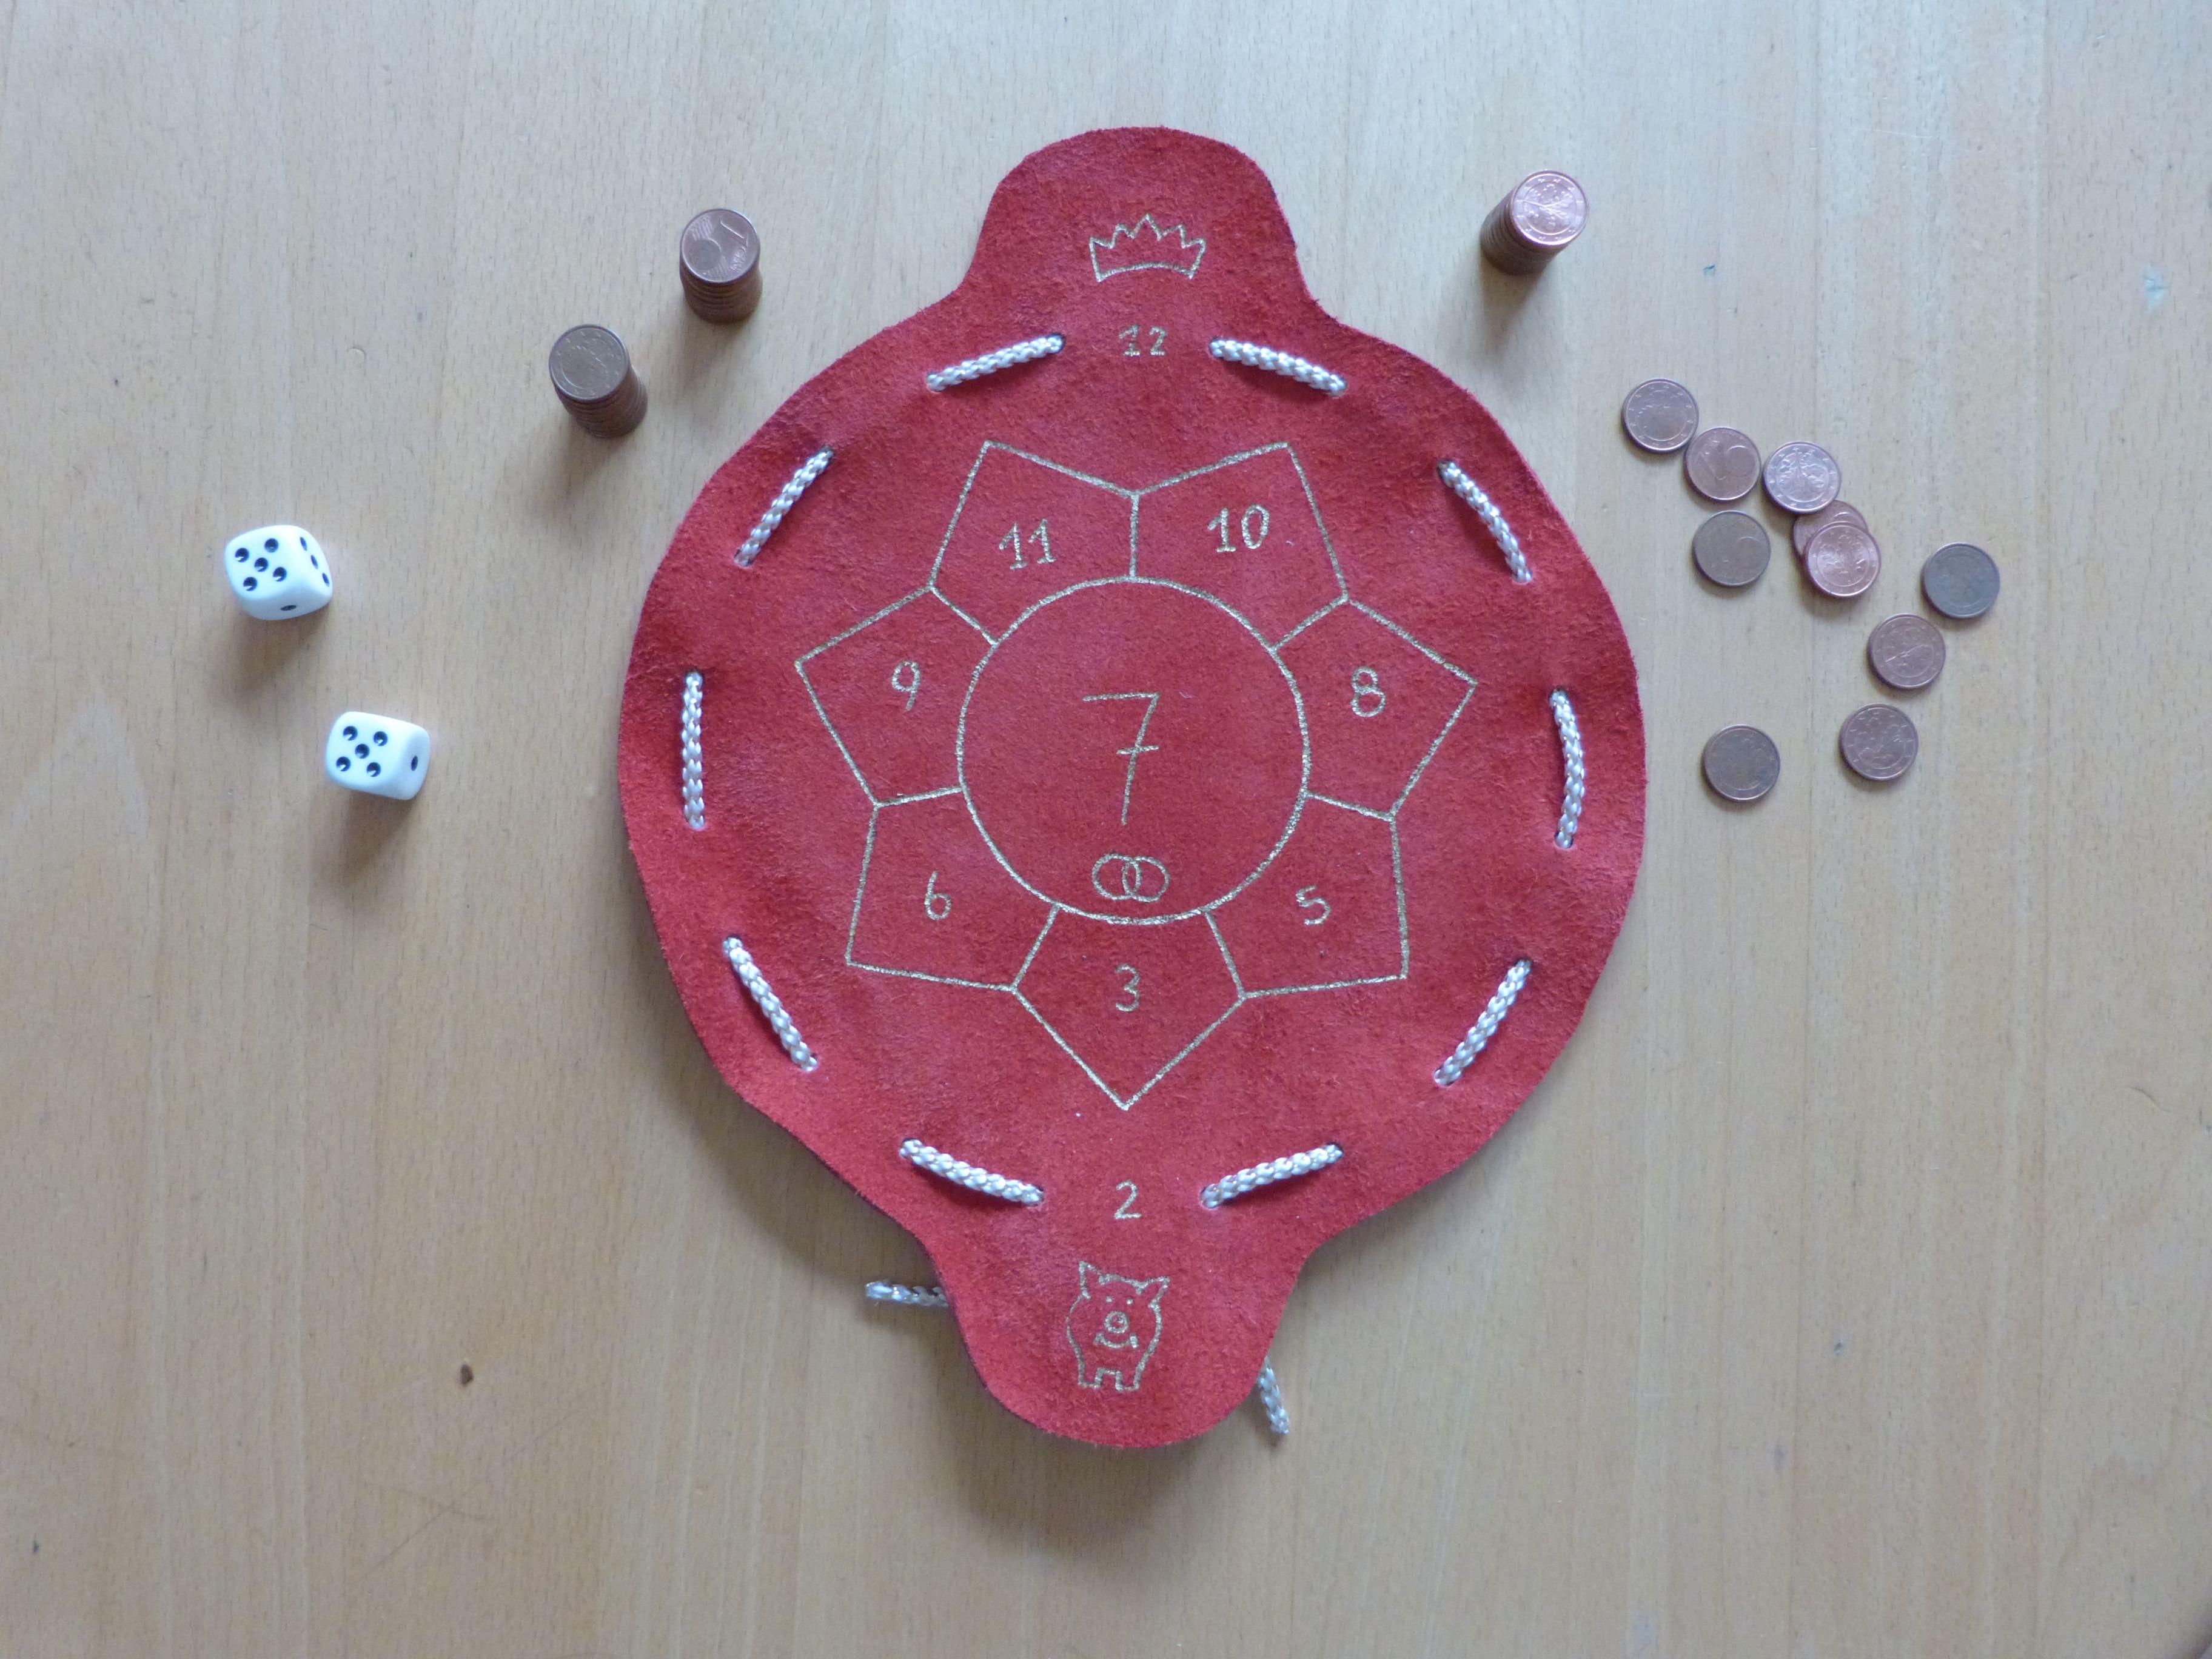 Spiel im Lederbeutel (Glückshaus) | Lederbeutel | Pinterest ...